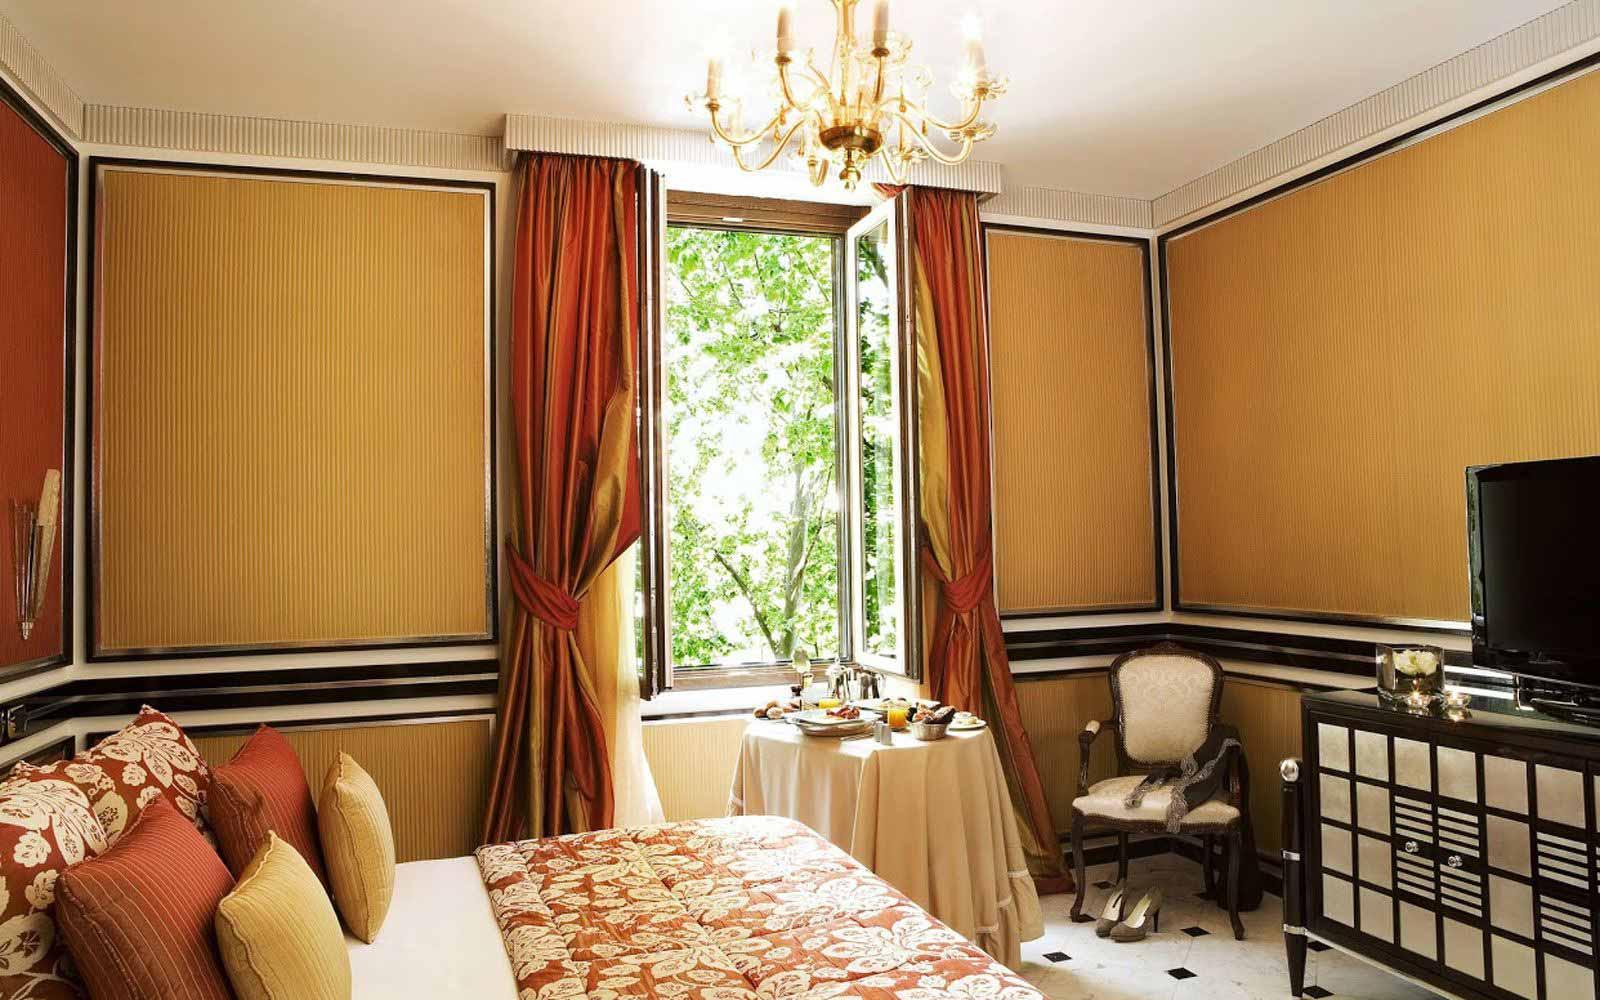 Deluxe room at Regina Hotel Baglioni